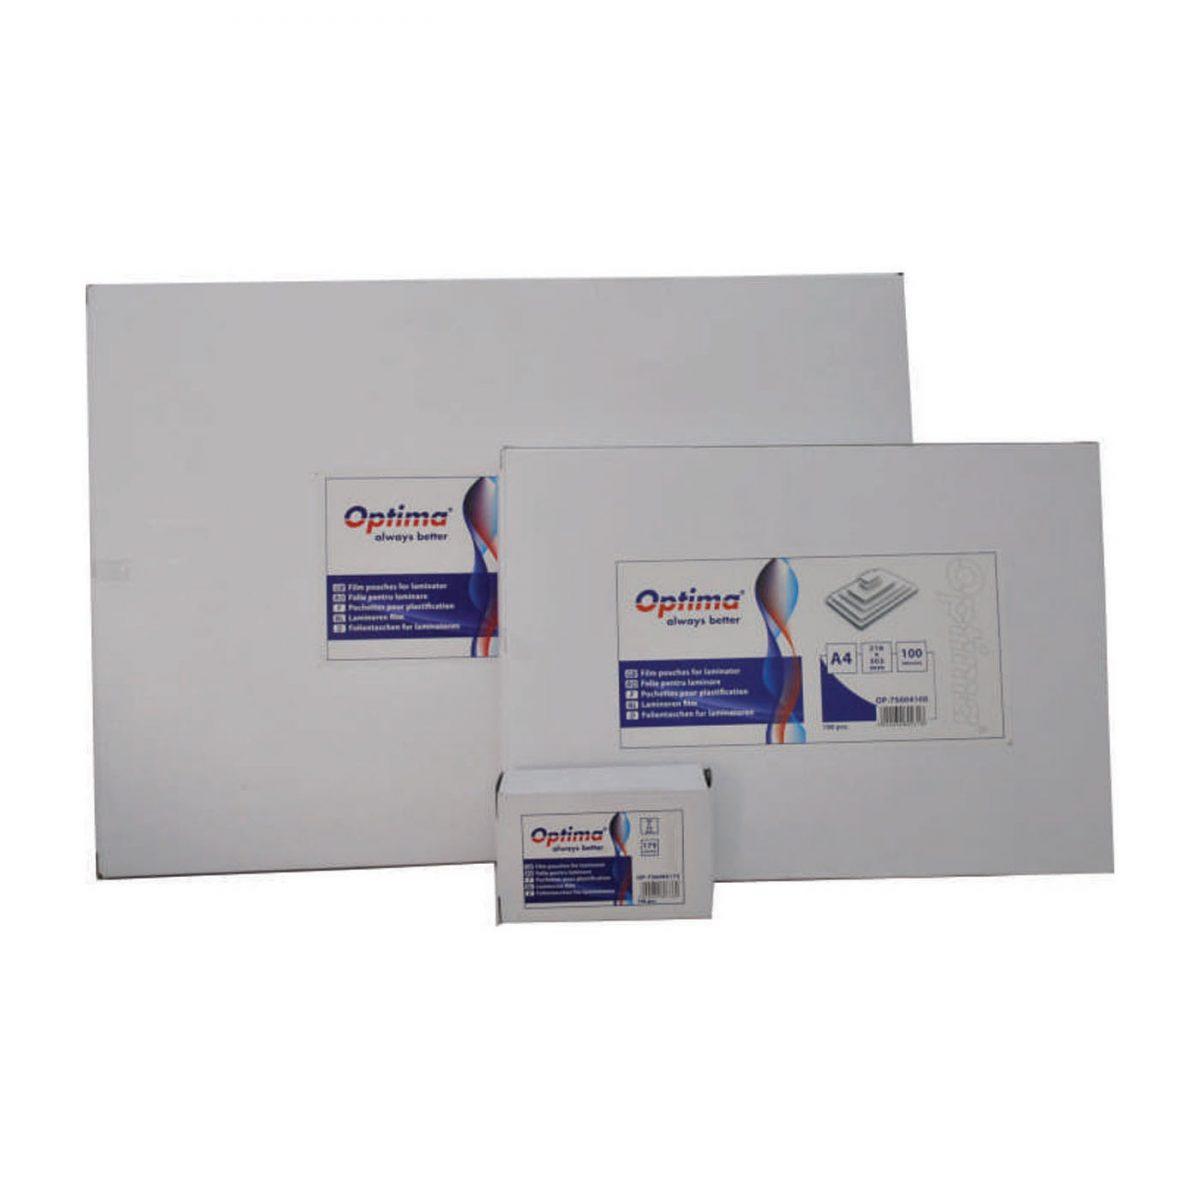 Folie pentru laminare A5 (154 x 216 mm), 80 microni 100buc/top Optima